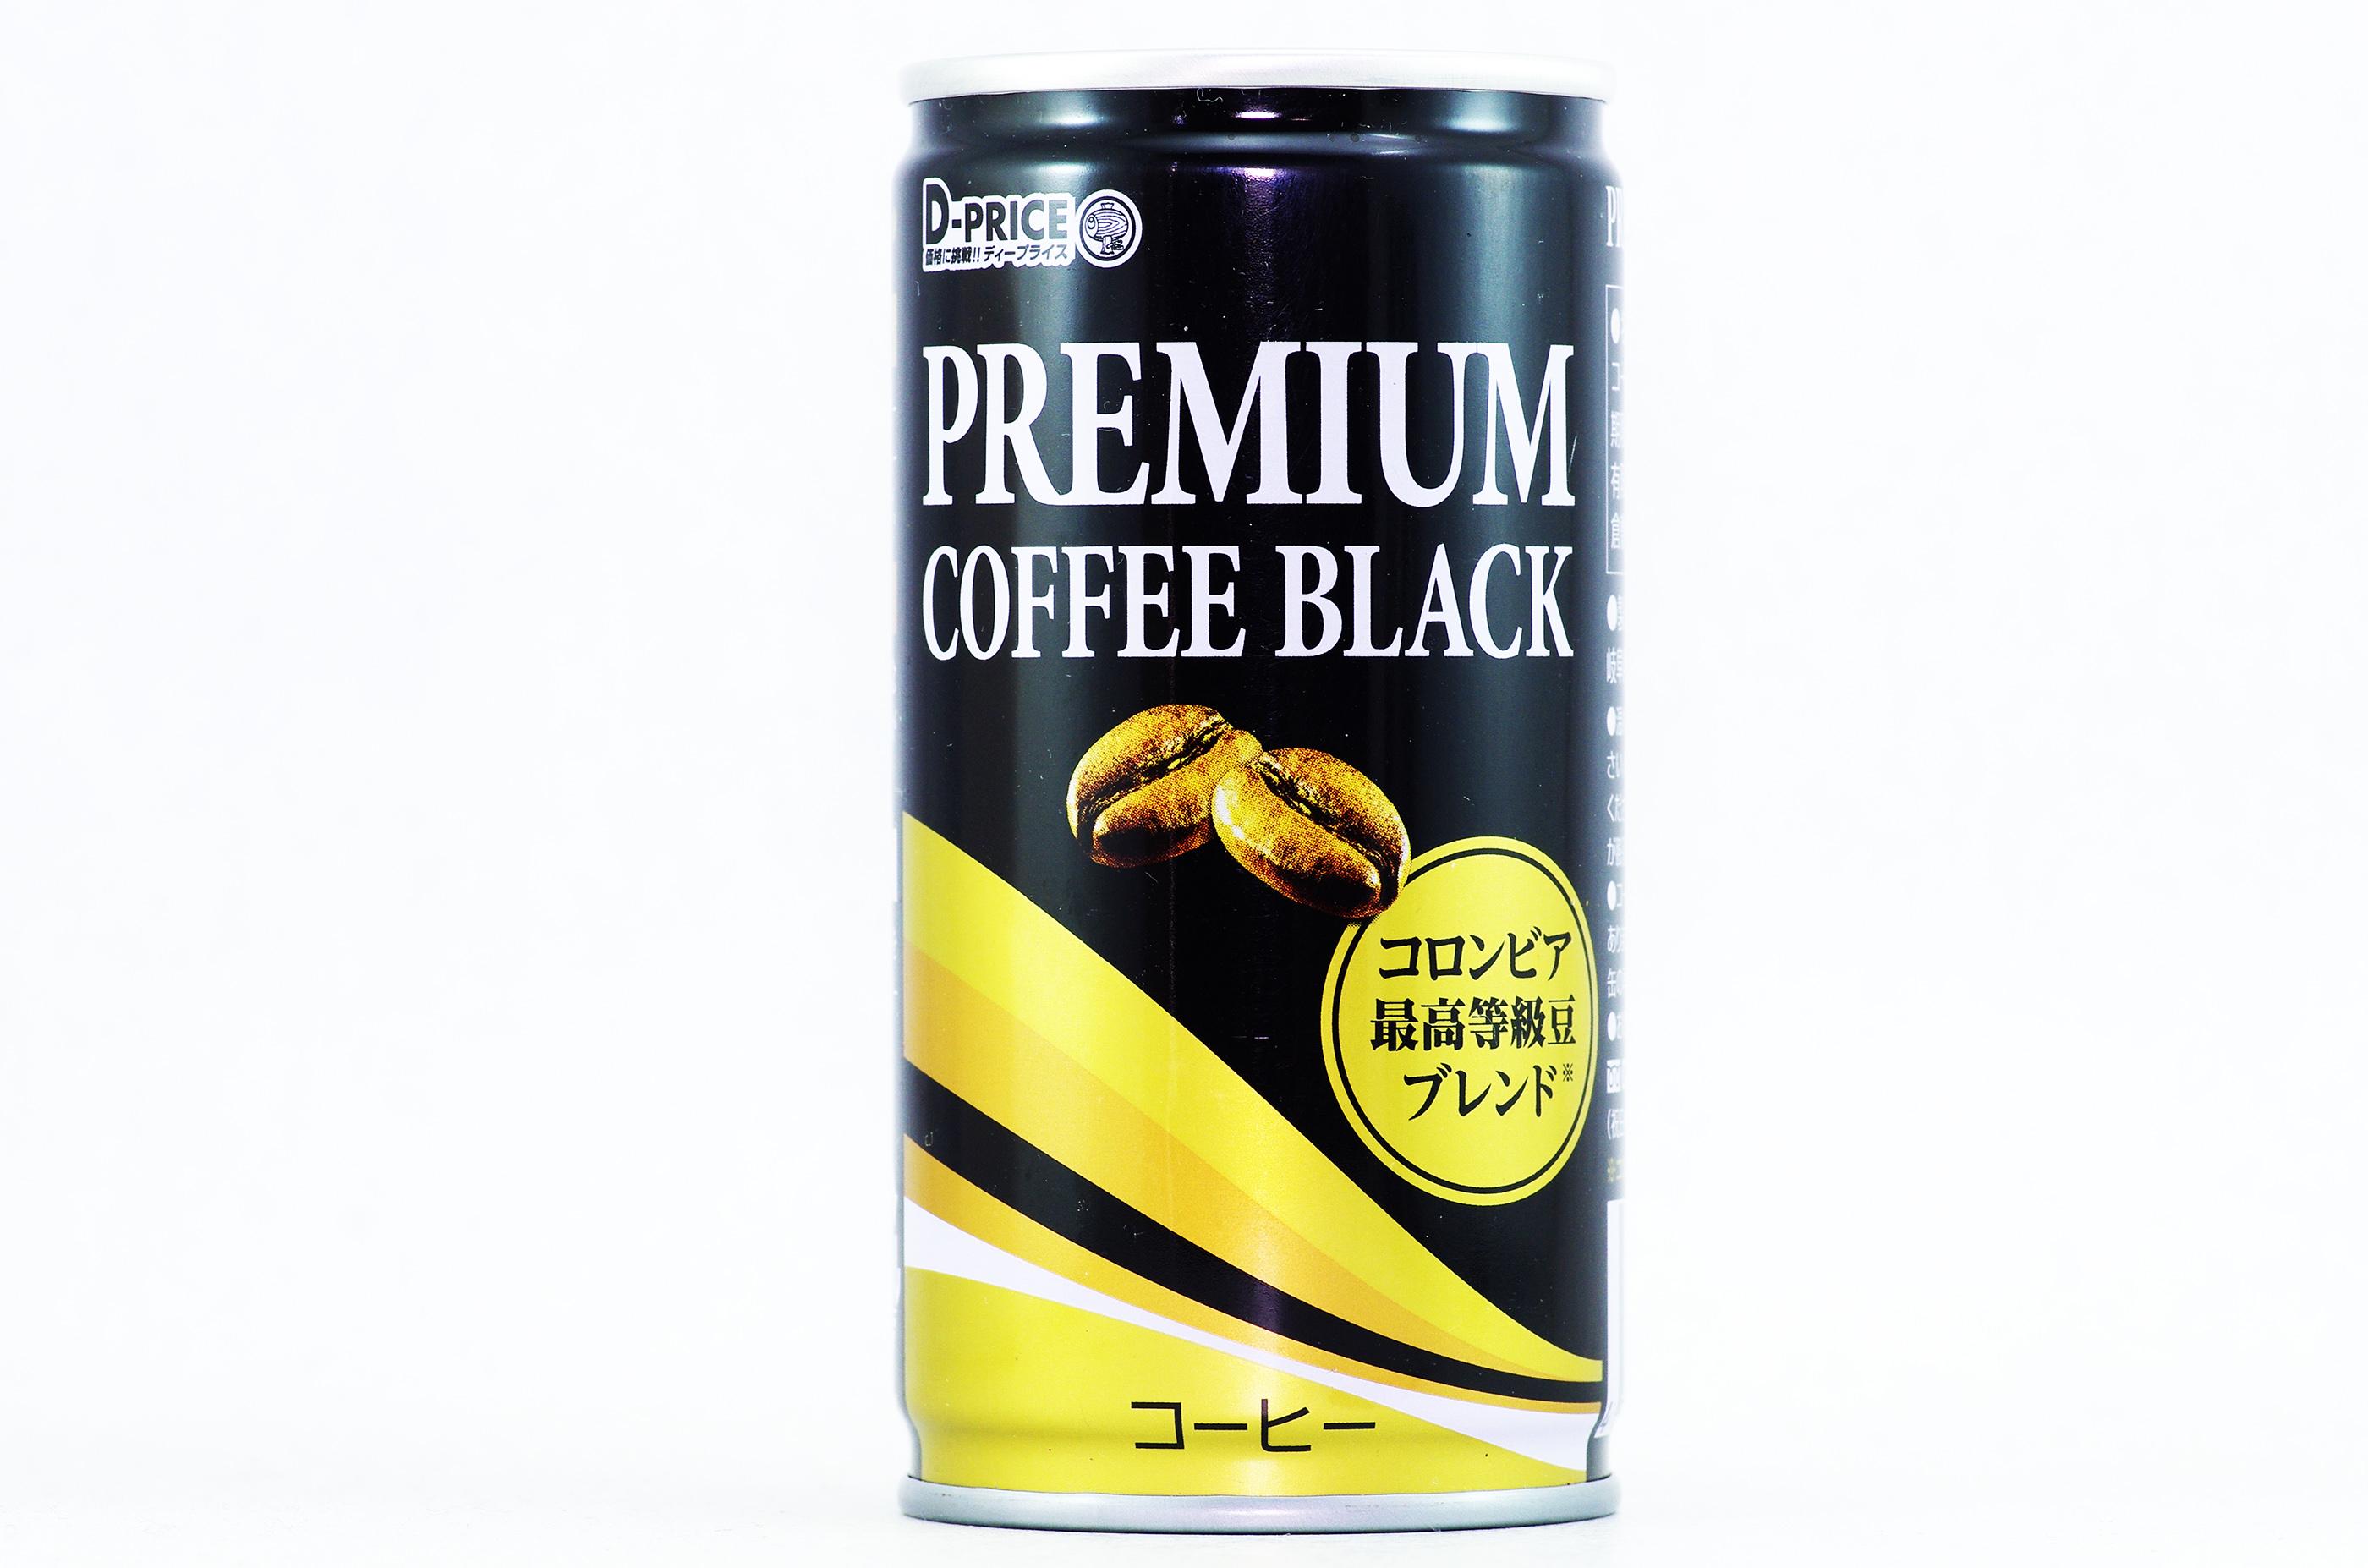 D-PRICE プレミアムコーヒー ブラック 2018年11月